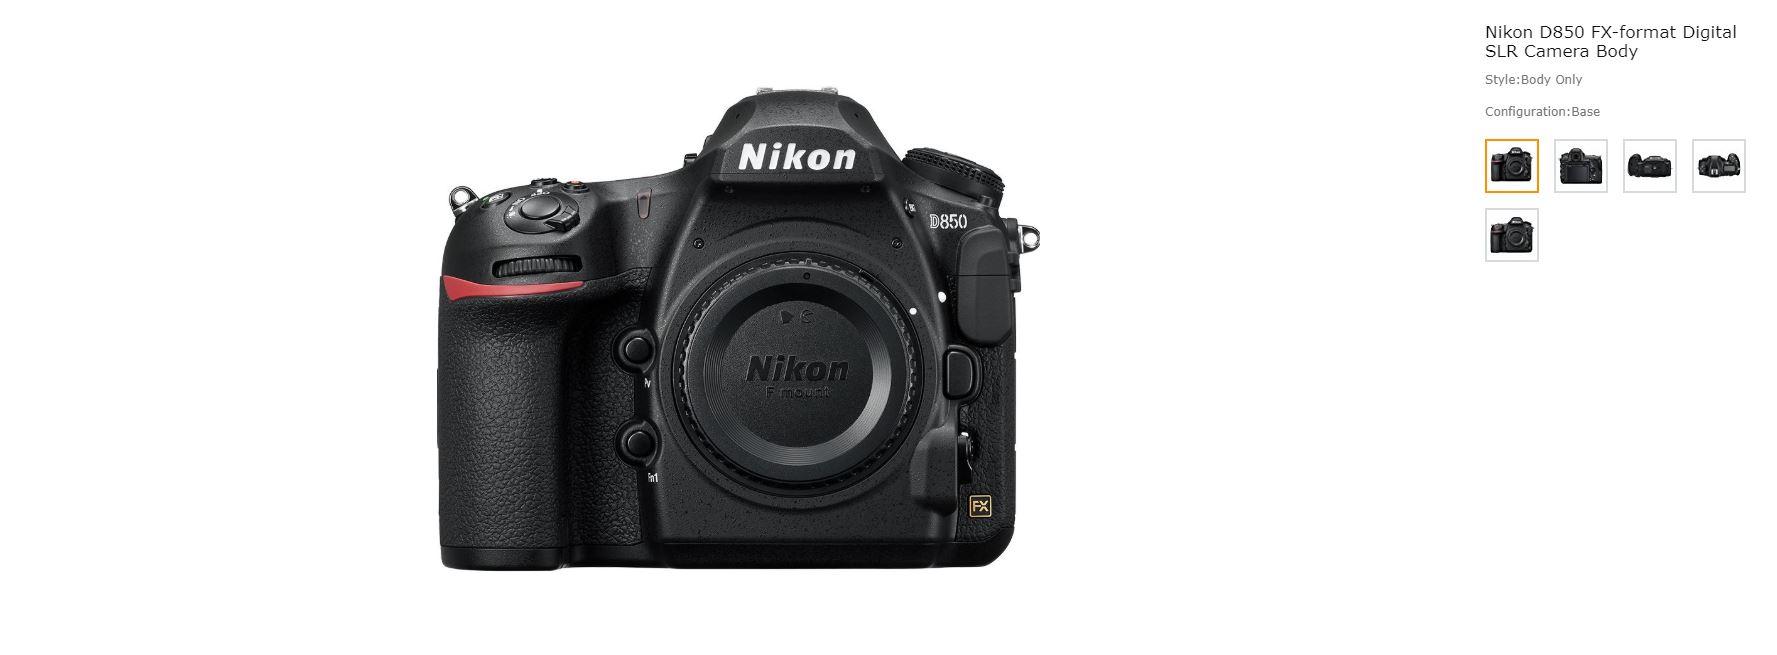 Nikon D850 Good luck getting one!!